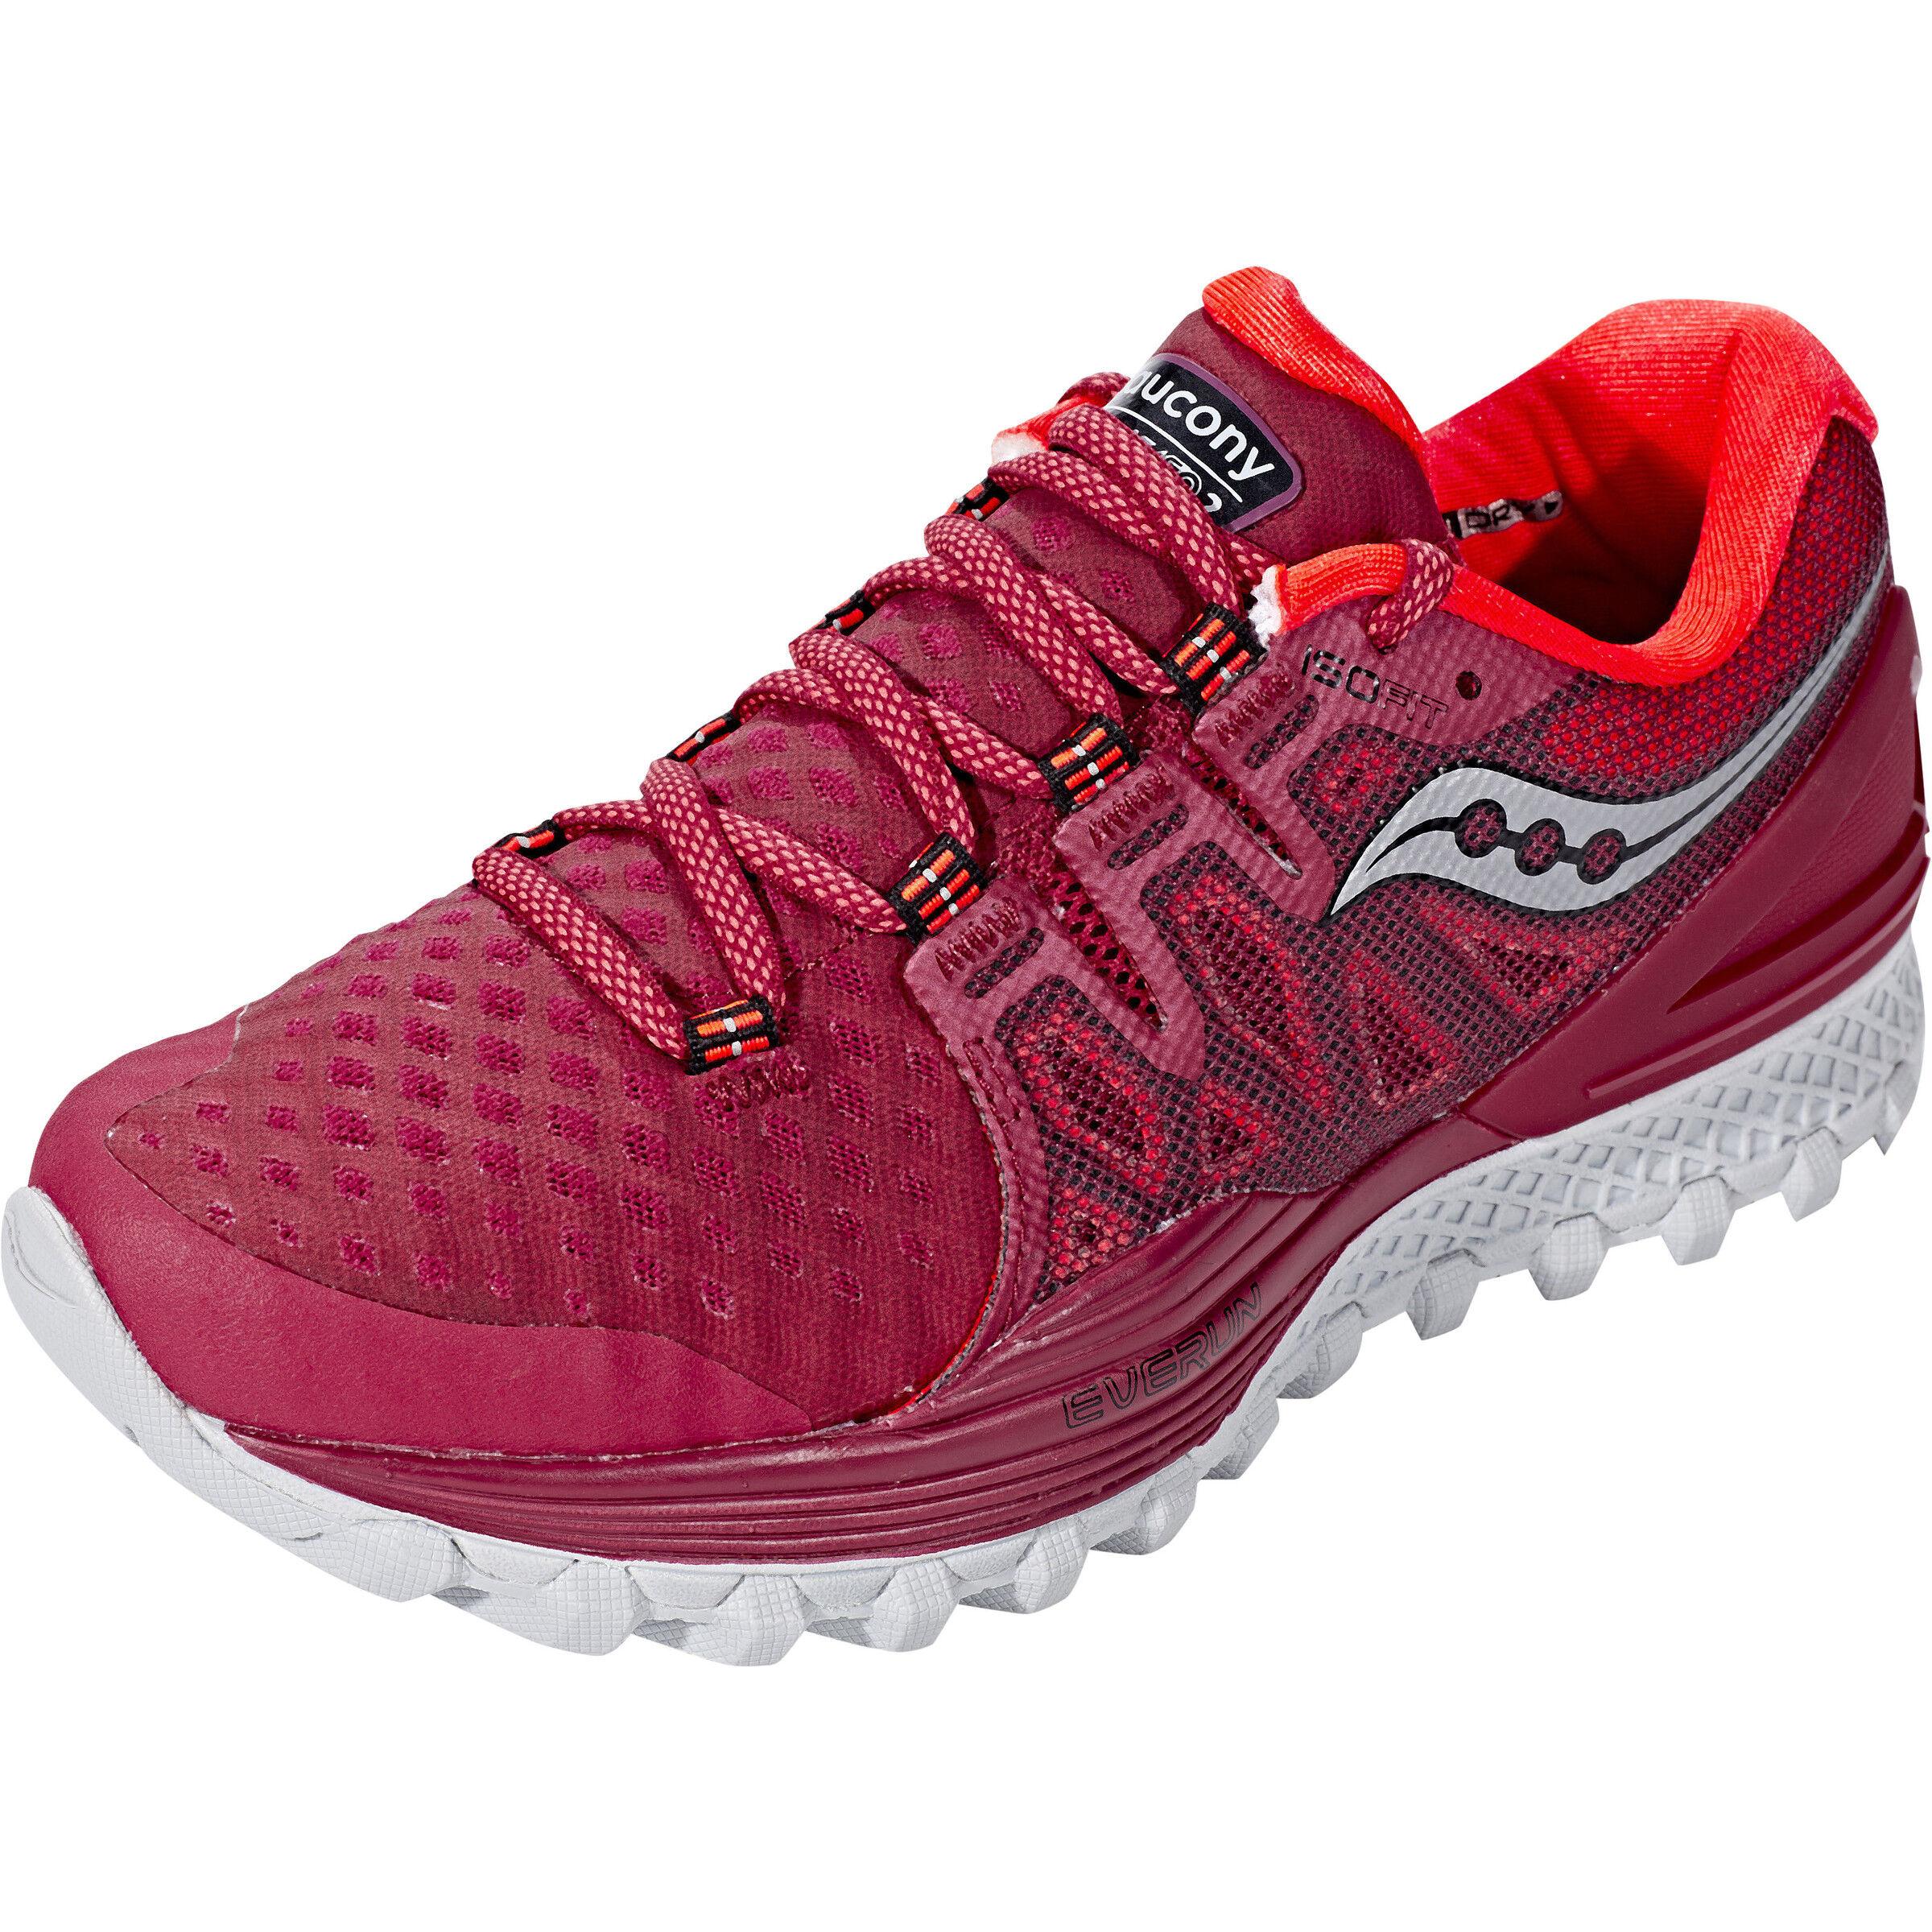 adidas Solar Drive 19 Low Cut Schuhe Damen tech inkfootwear whiteglossy pink